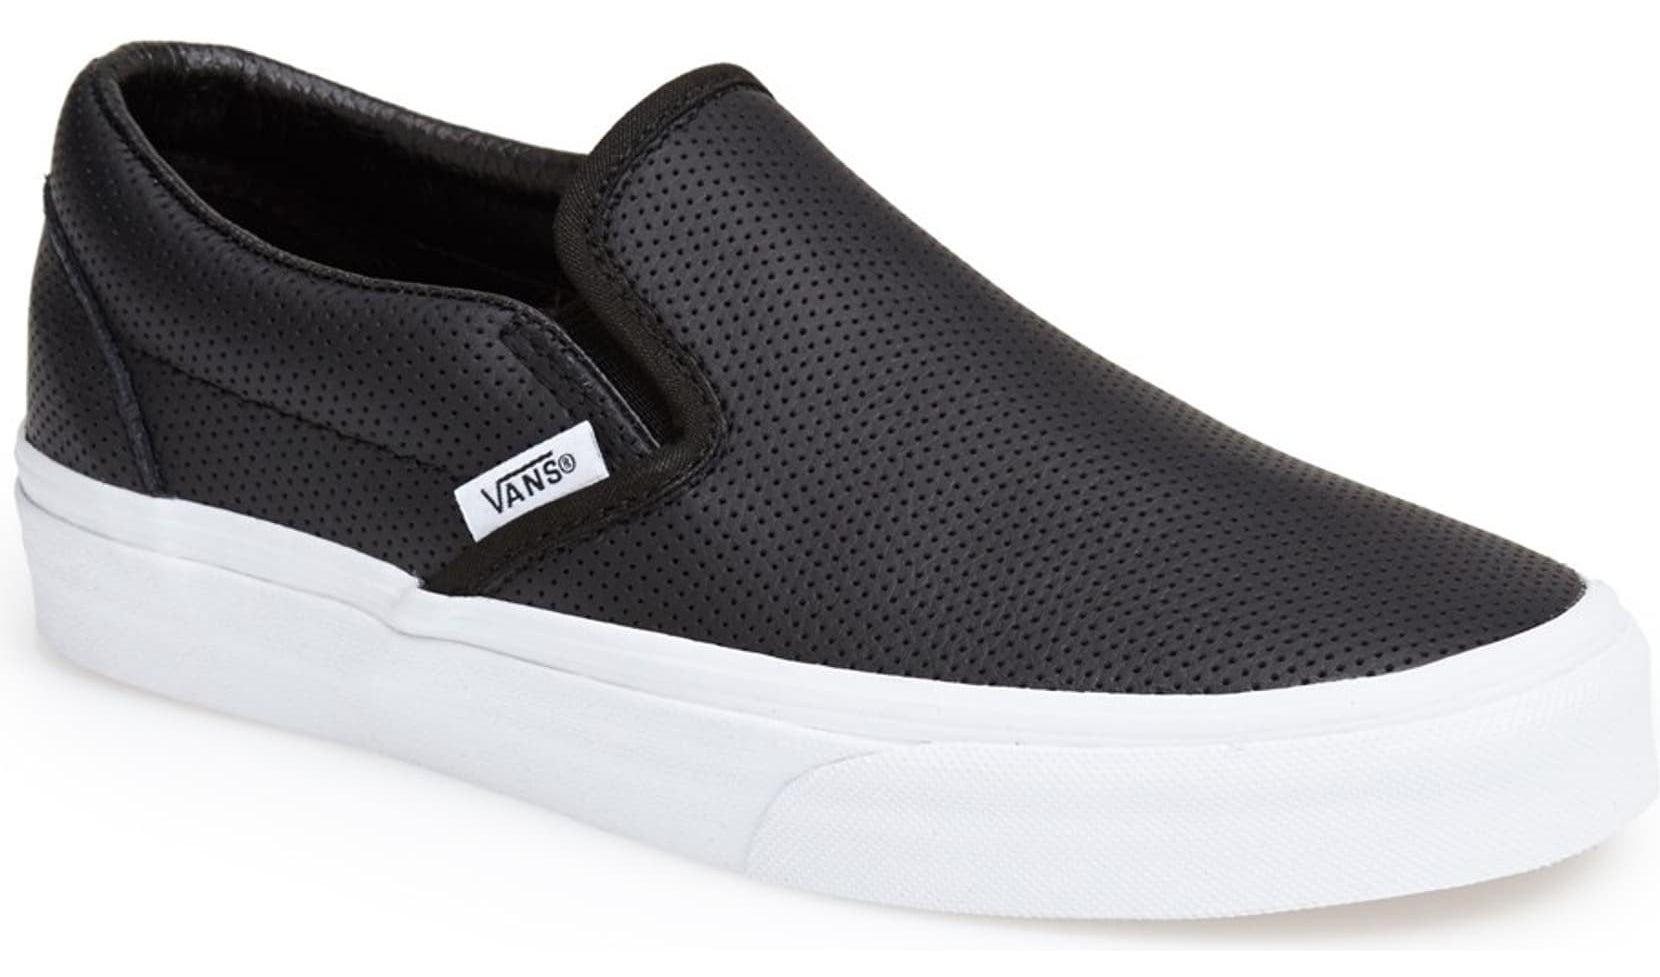 The slip-on sneakers in black